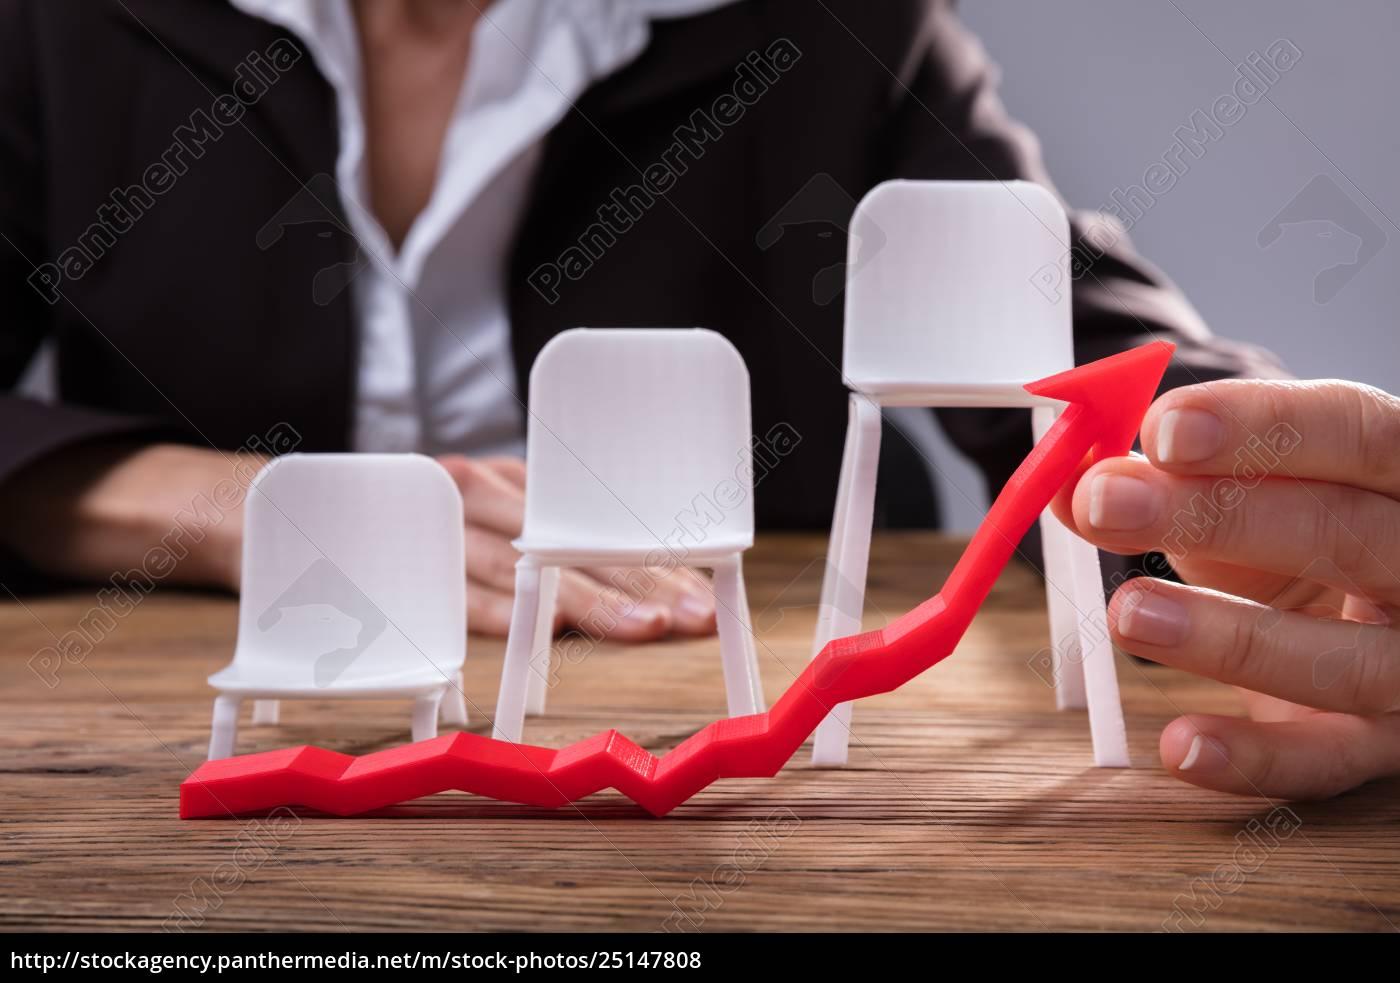 businessperson, holding, red, arrow, showing, upward - 25147808